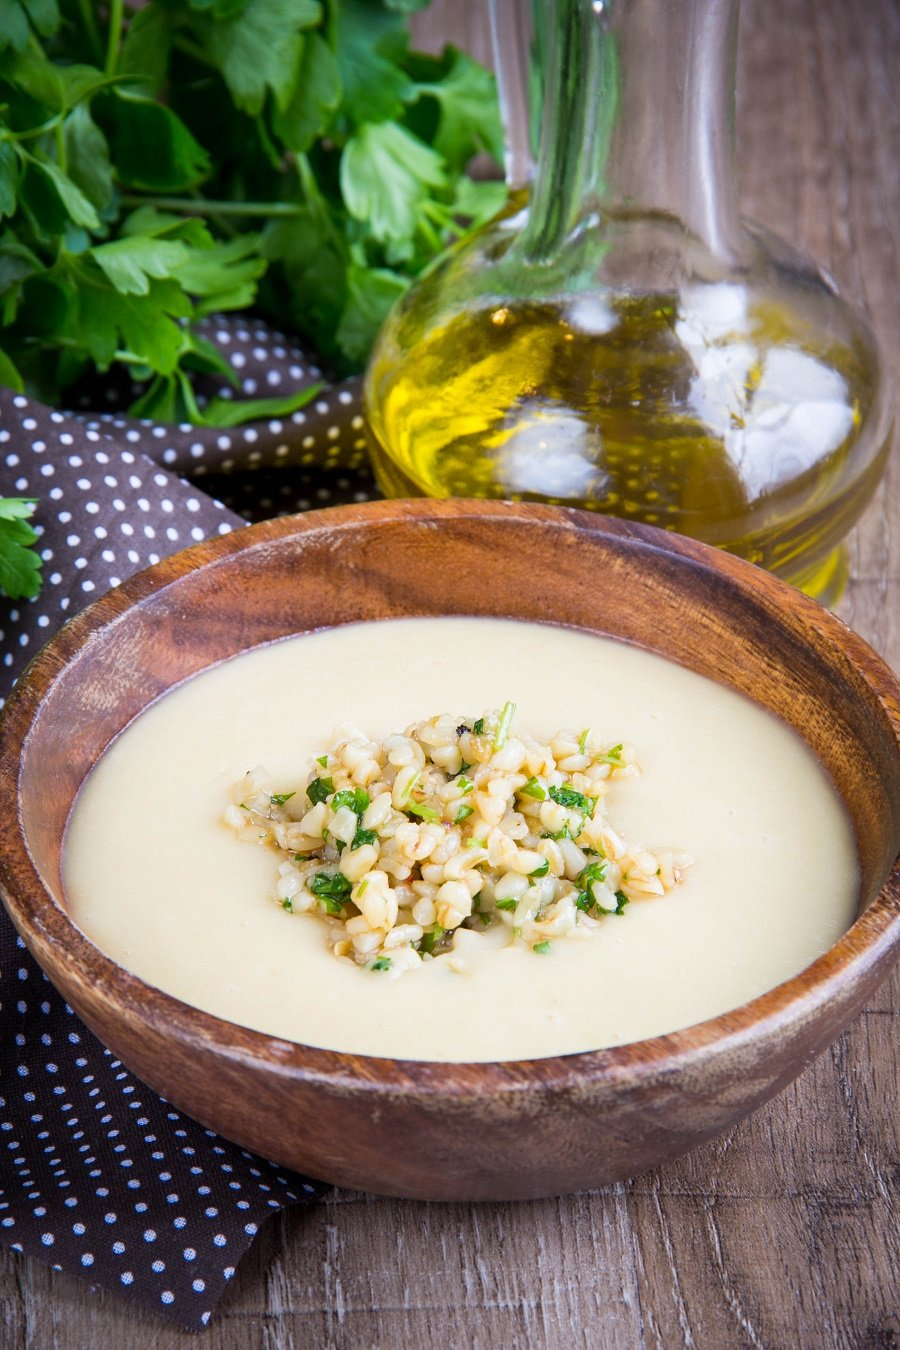 Creamy and delicious Mushroom Asparagus Soup #Vegan #healthyfood #recipe